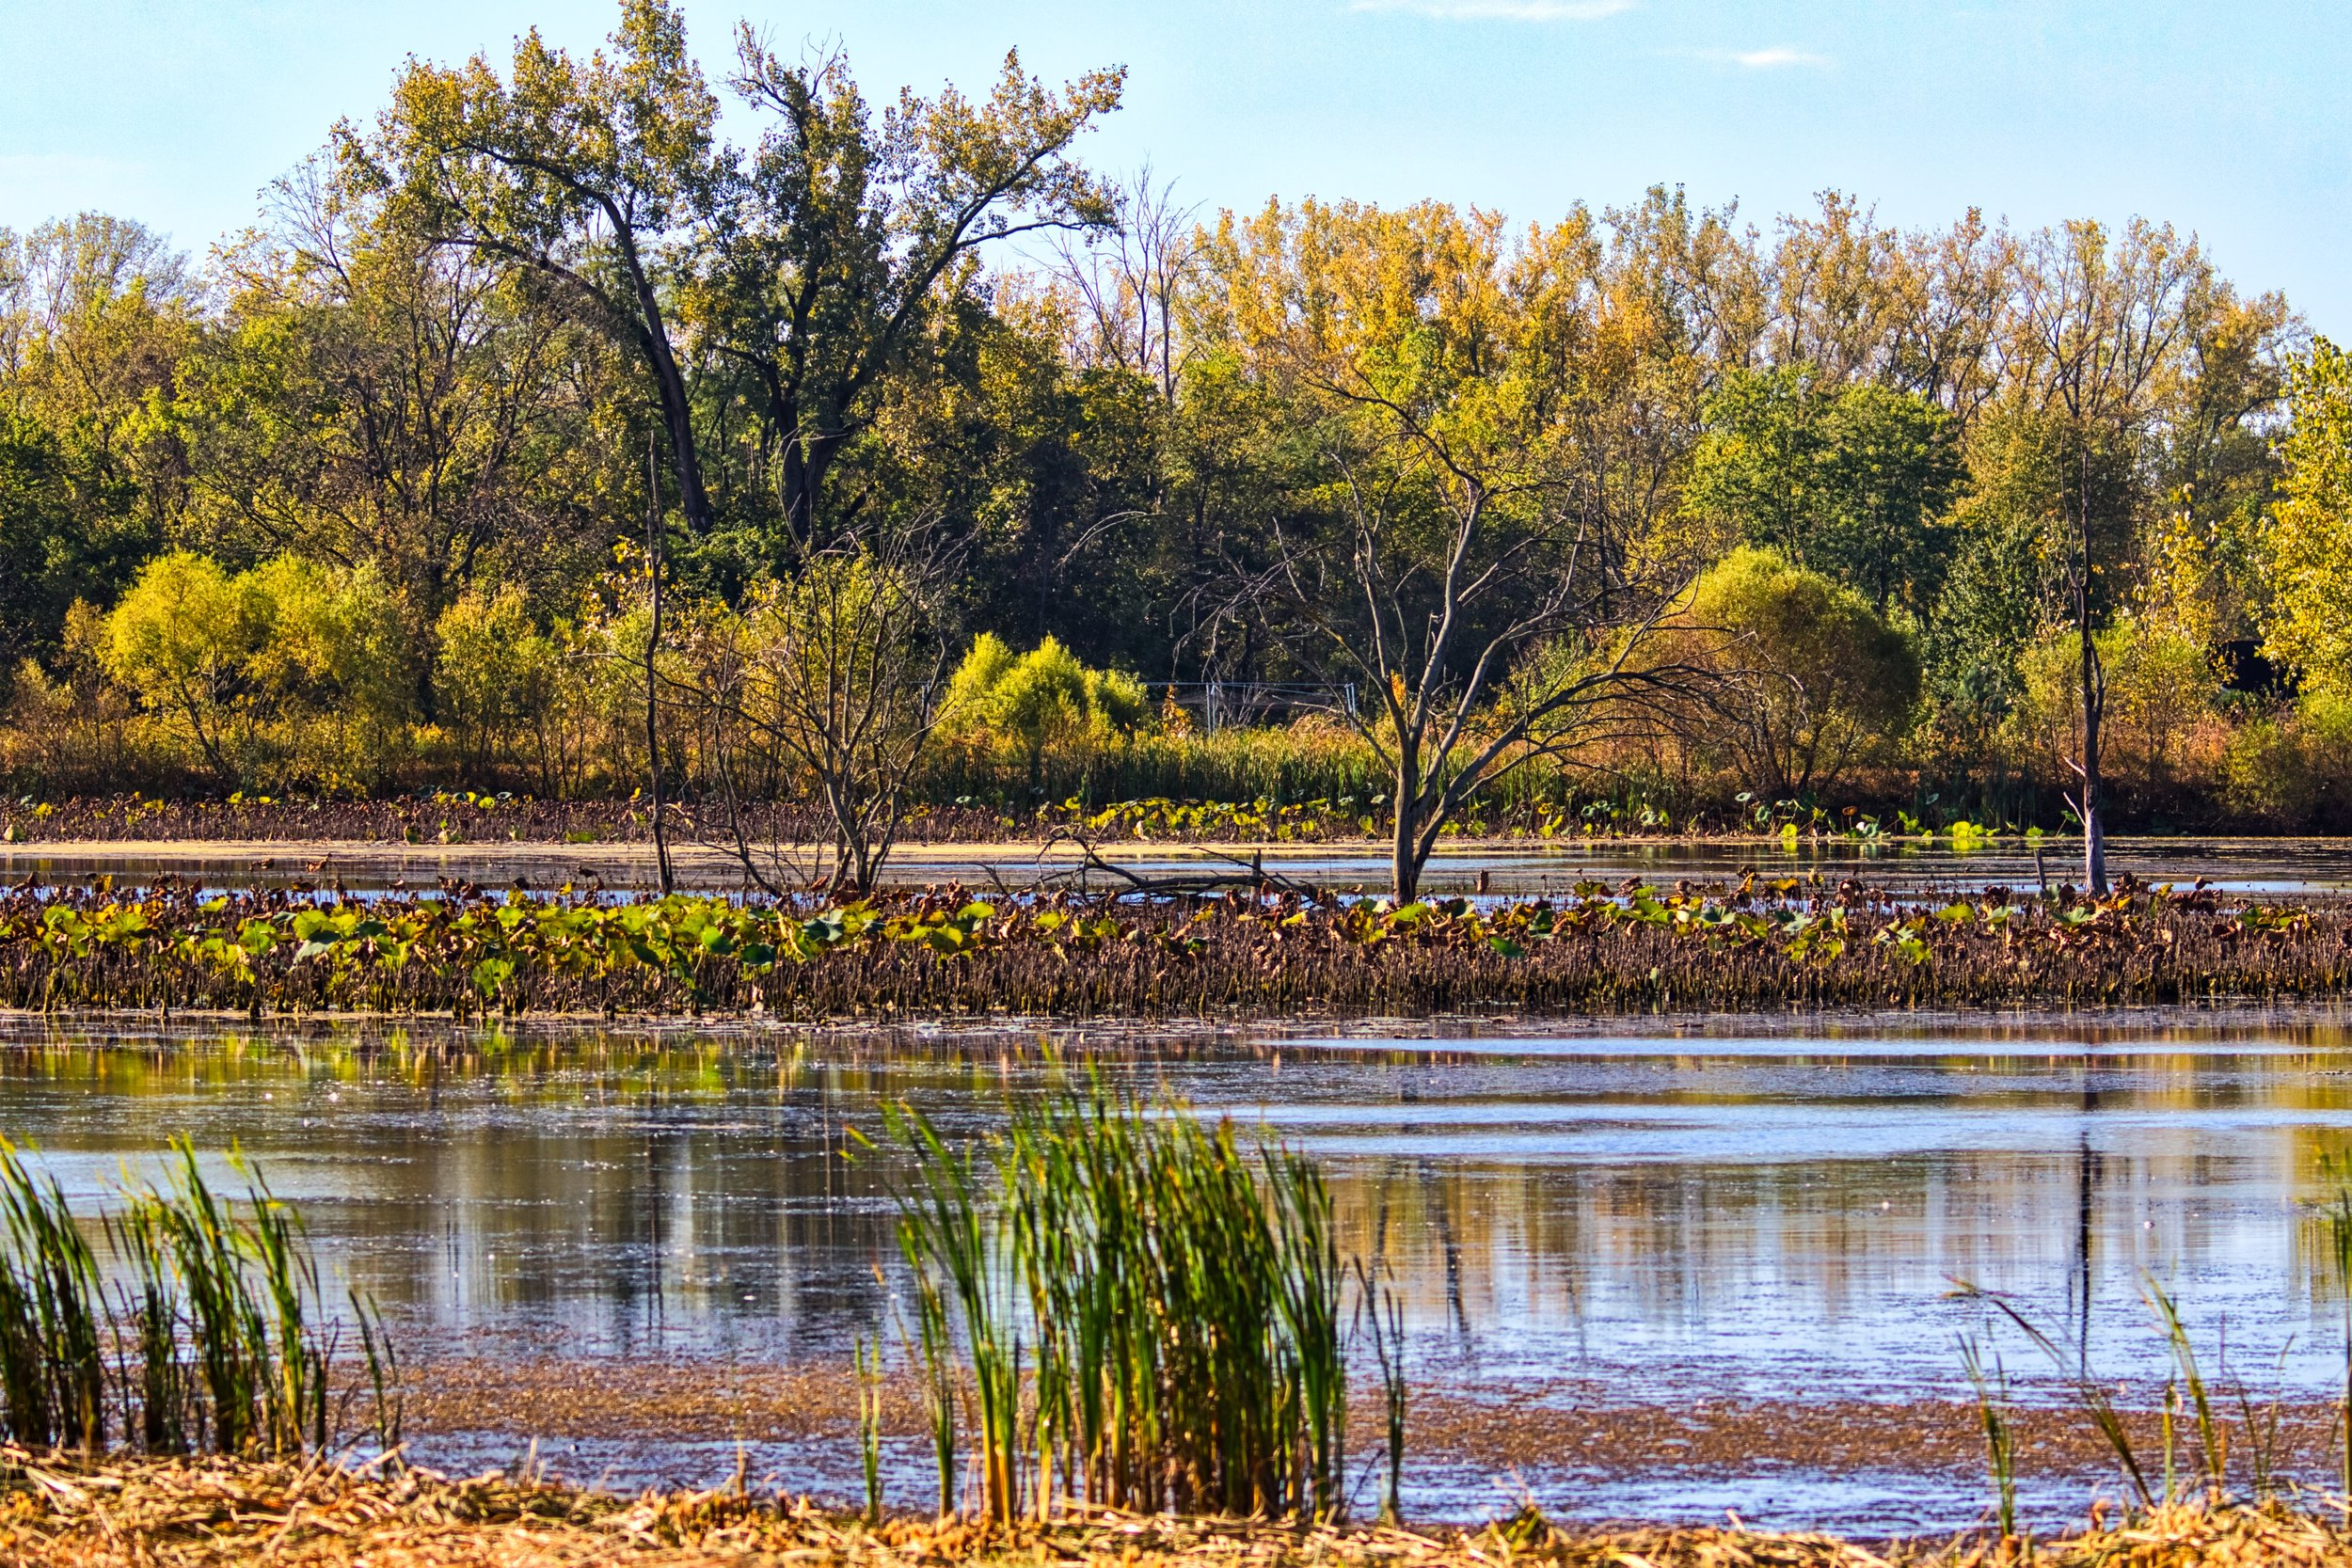 Pond at Pickerington Ponds